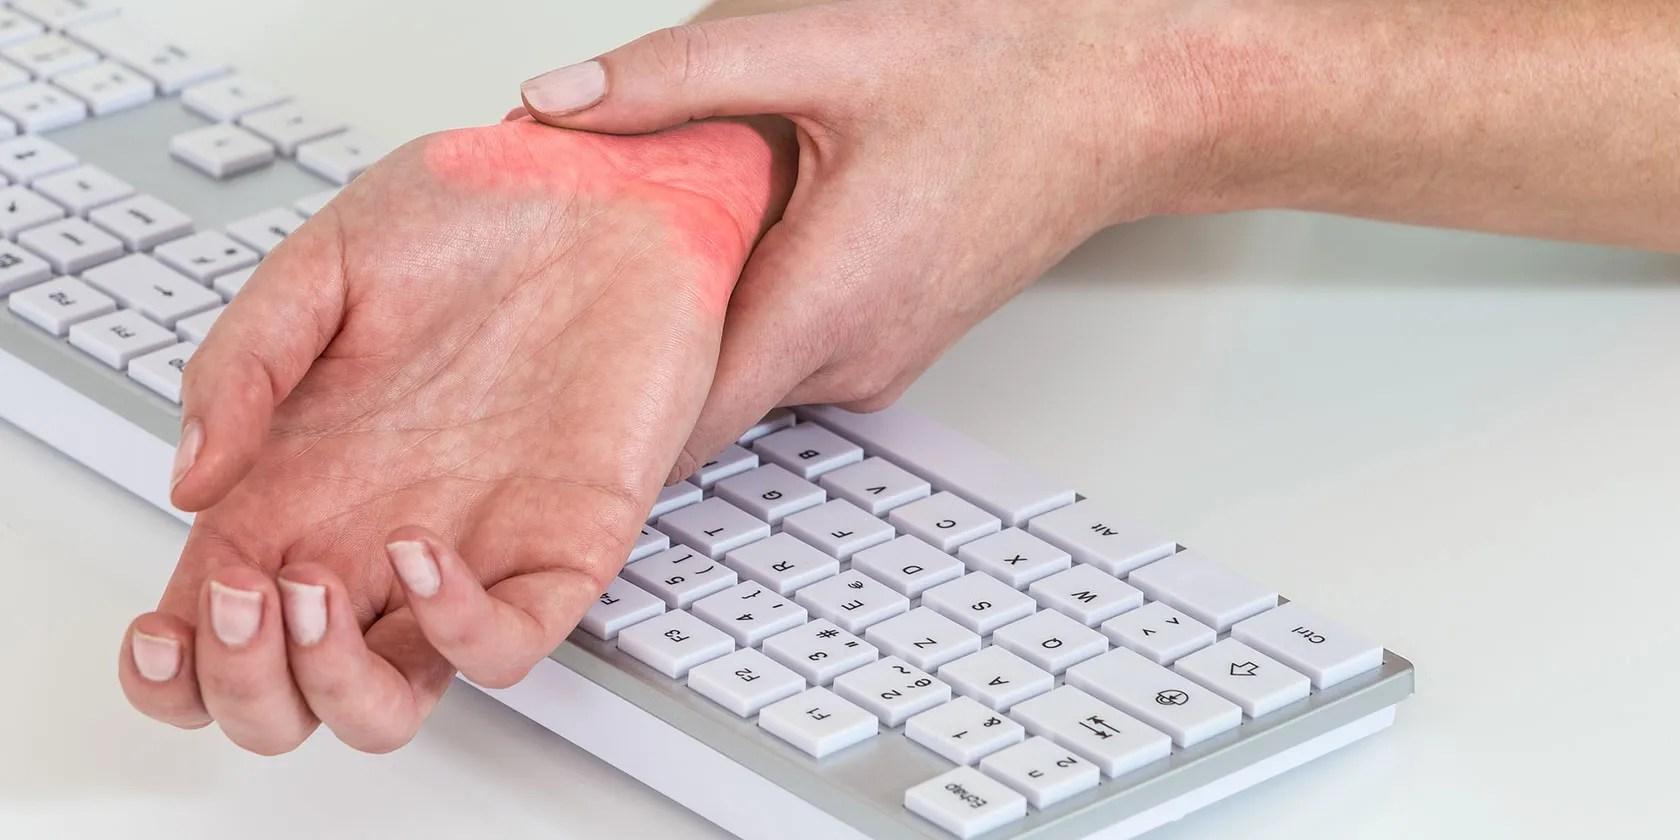 best-ergonomic-keyboards